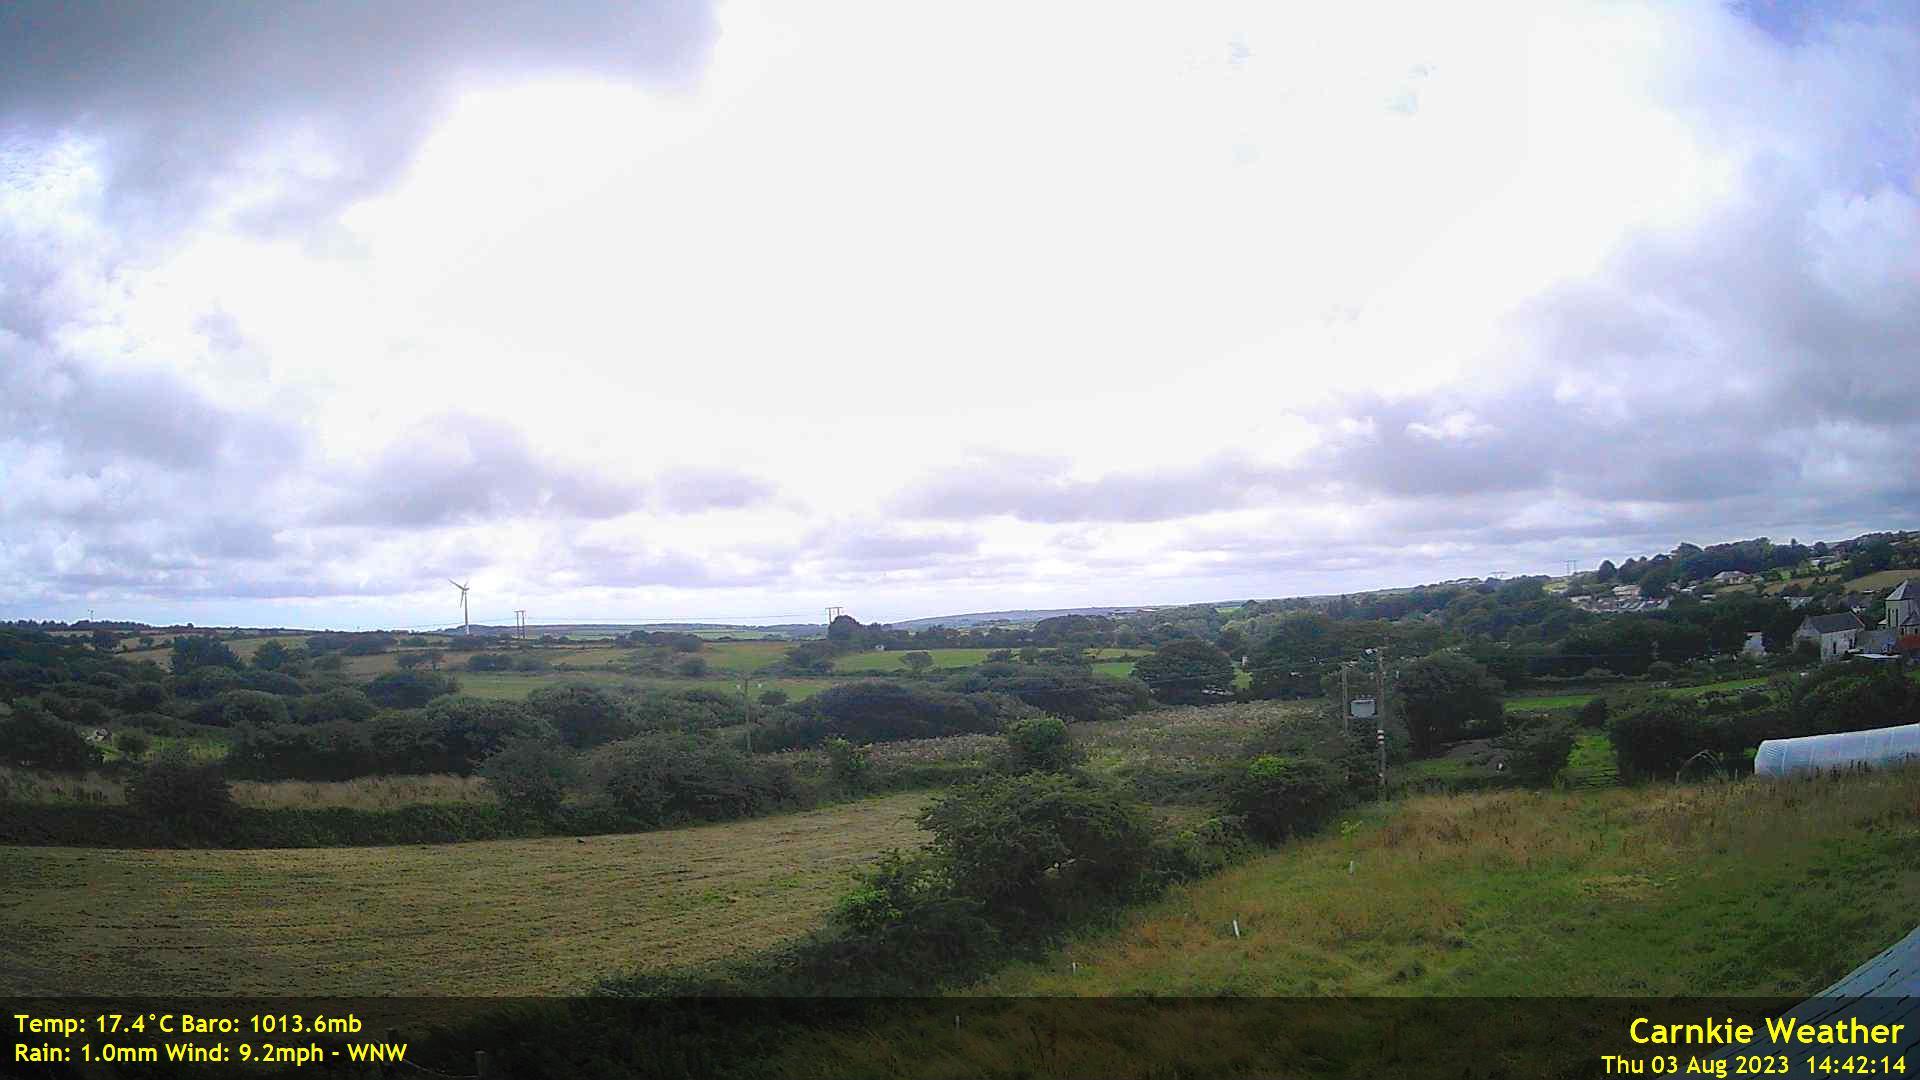 Carnkie (Redruth), Cornwall, England - Webcam Image